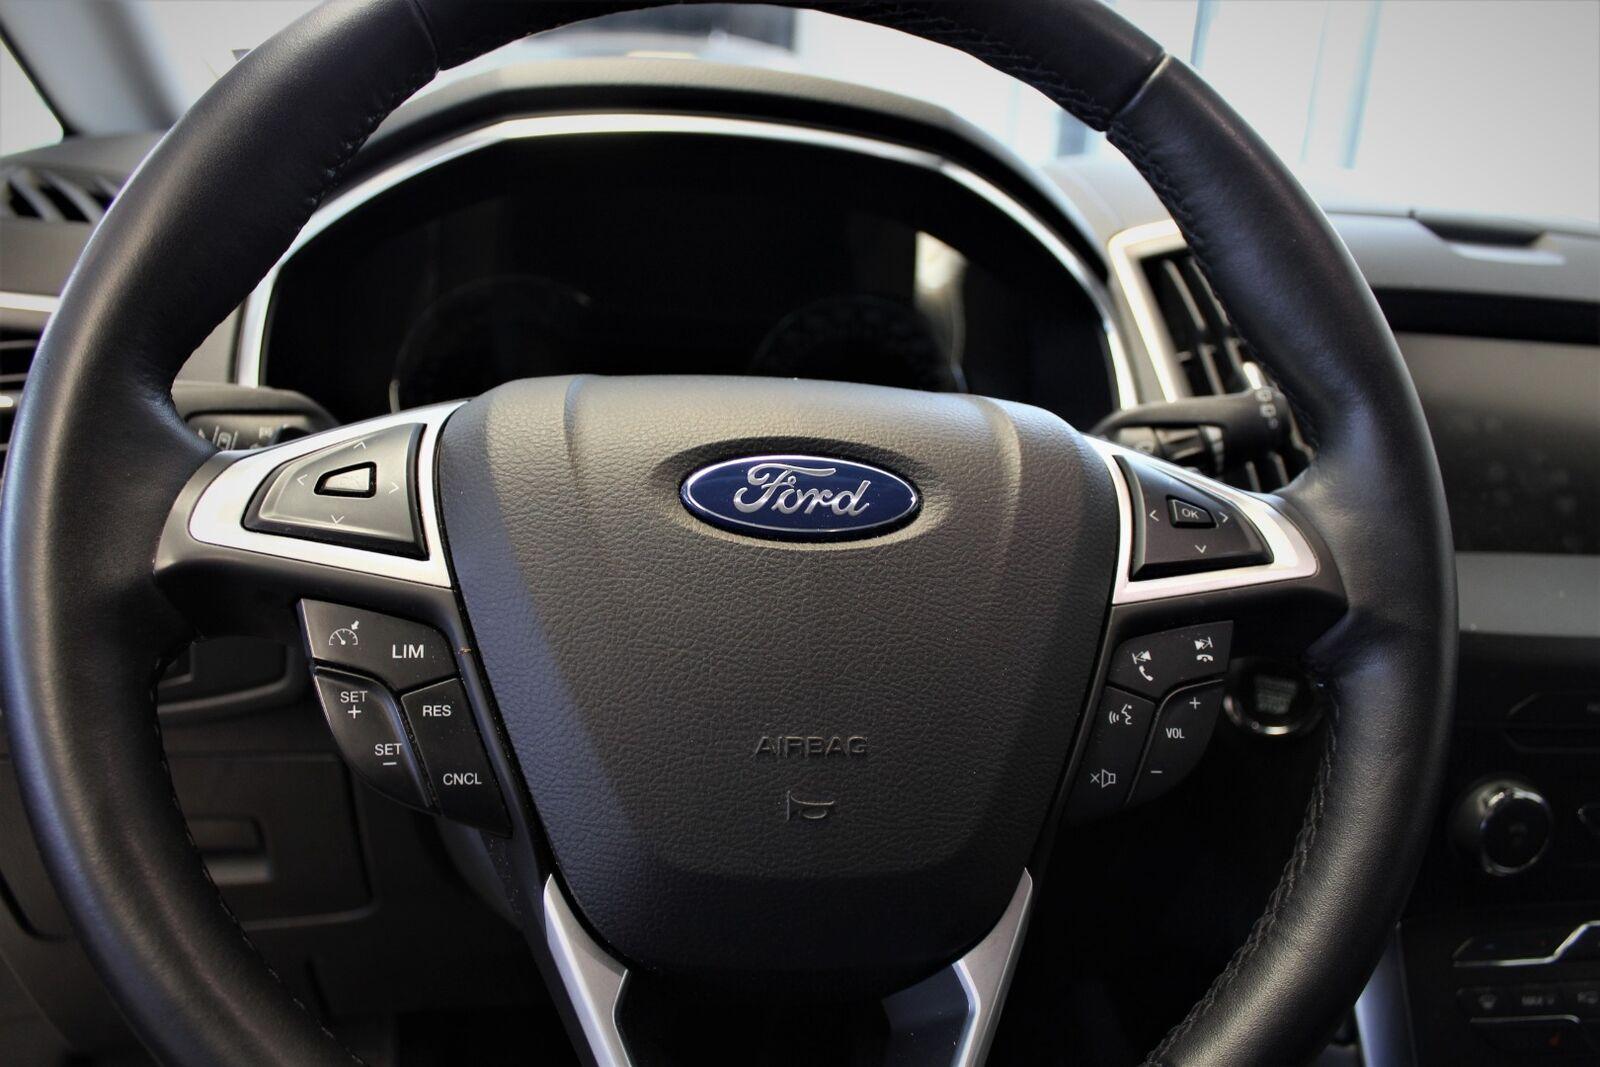 Ford S-MAX 2,0 TDCi 180 Titanium aut. 7prs - billede 6